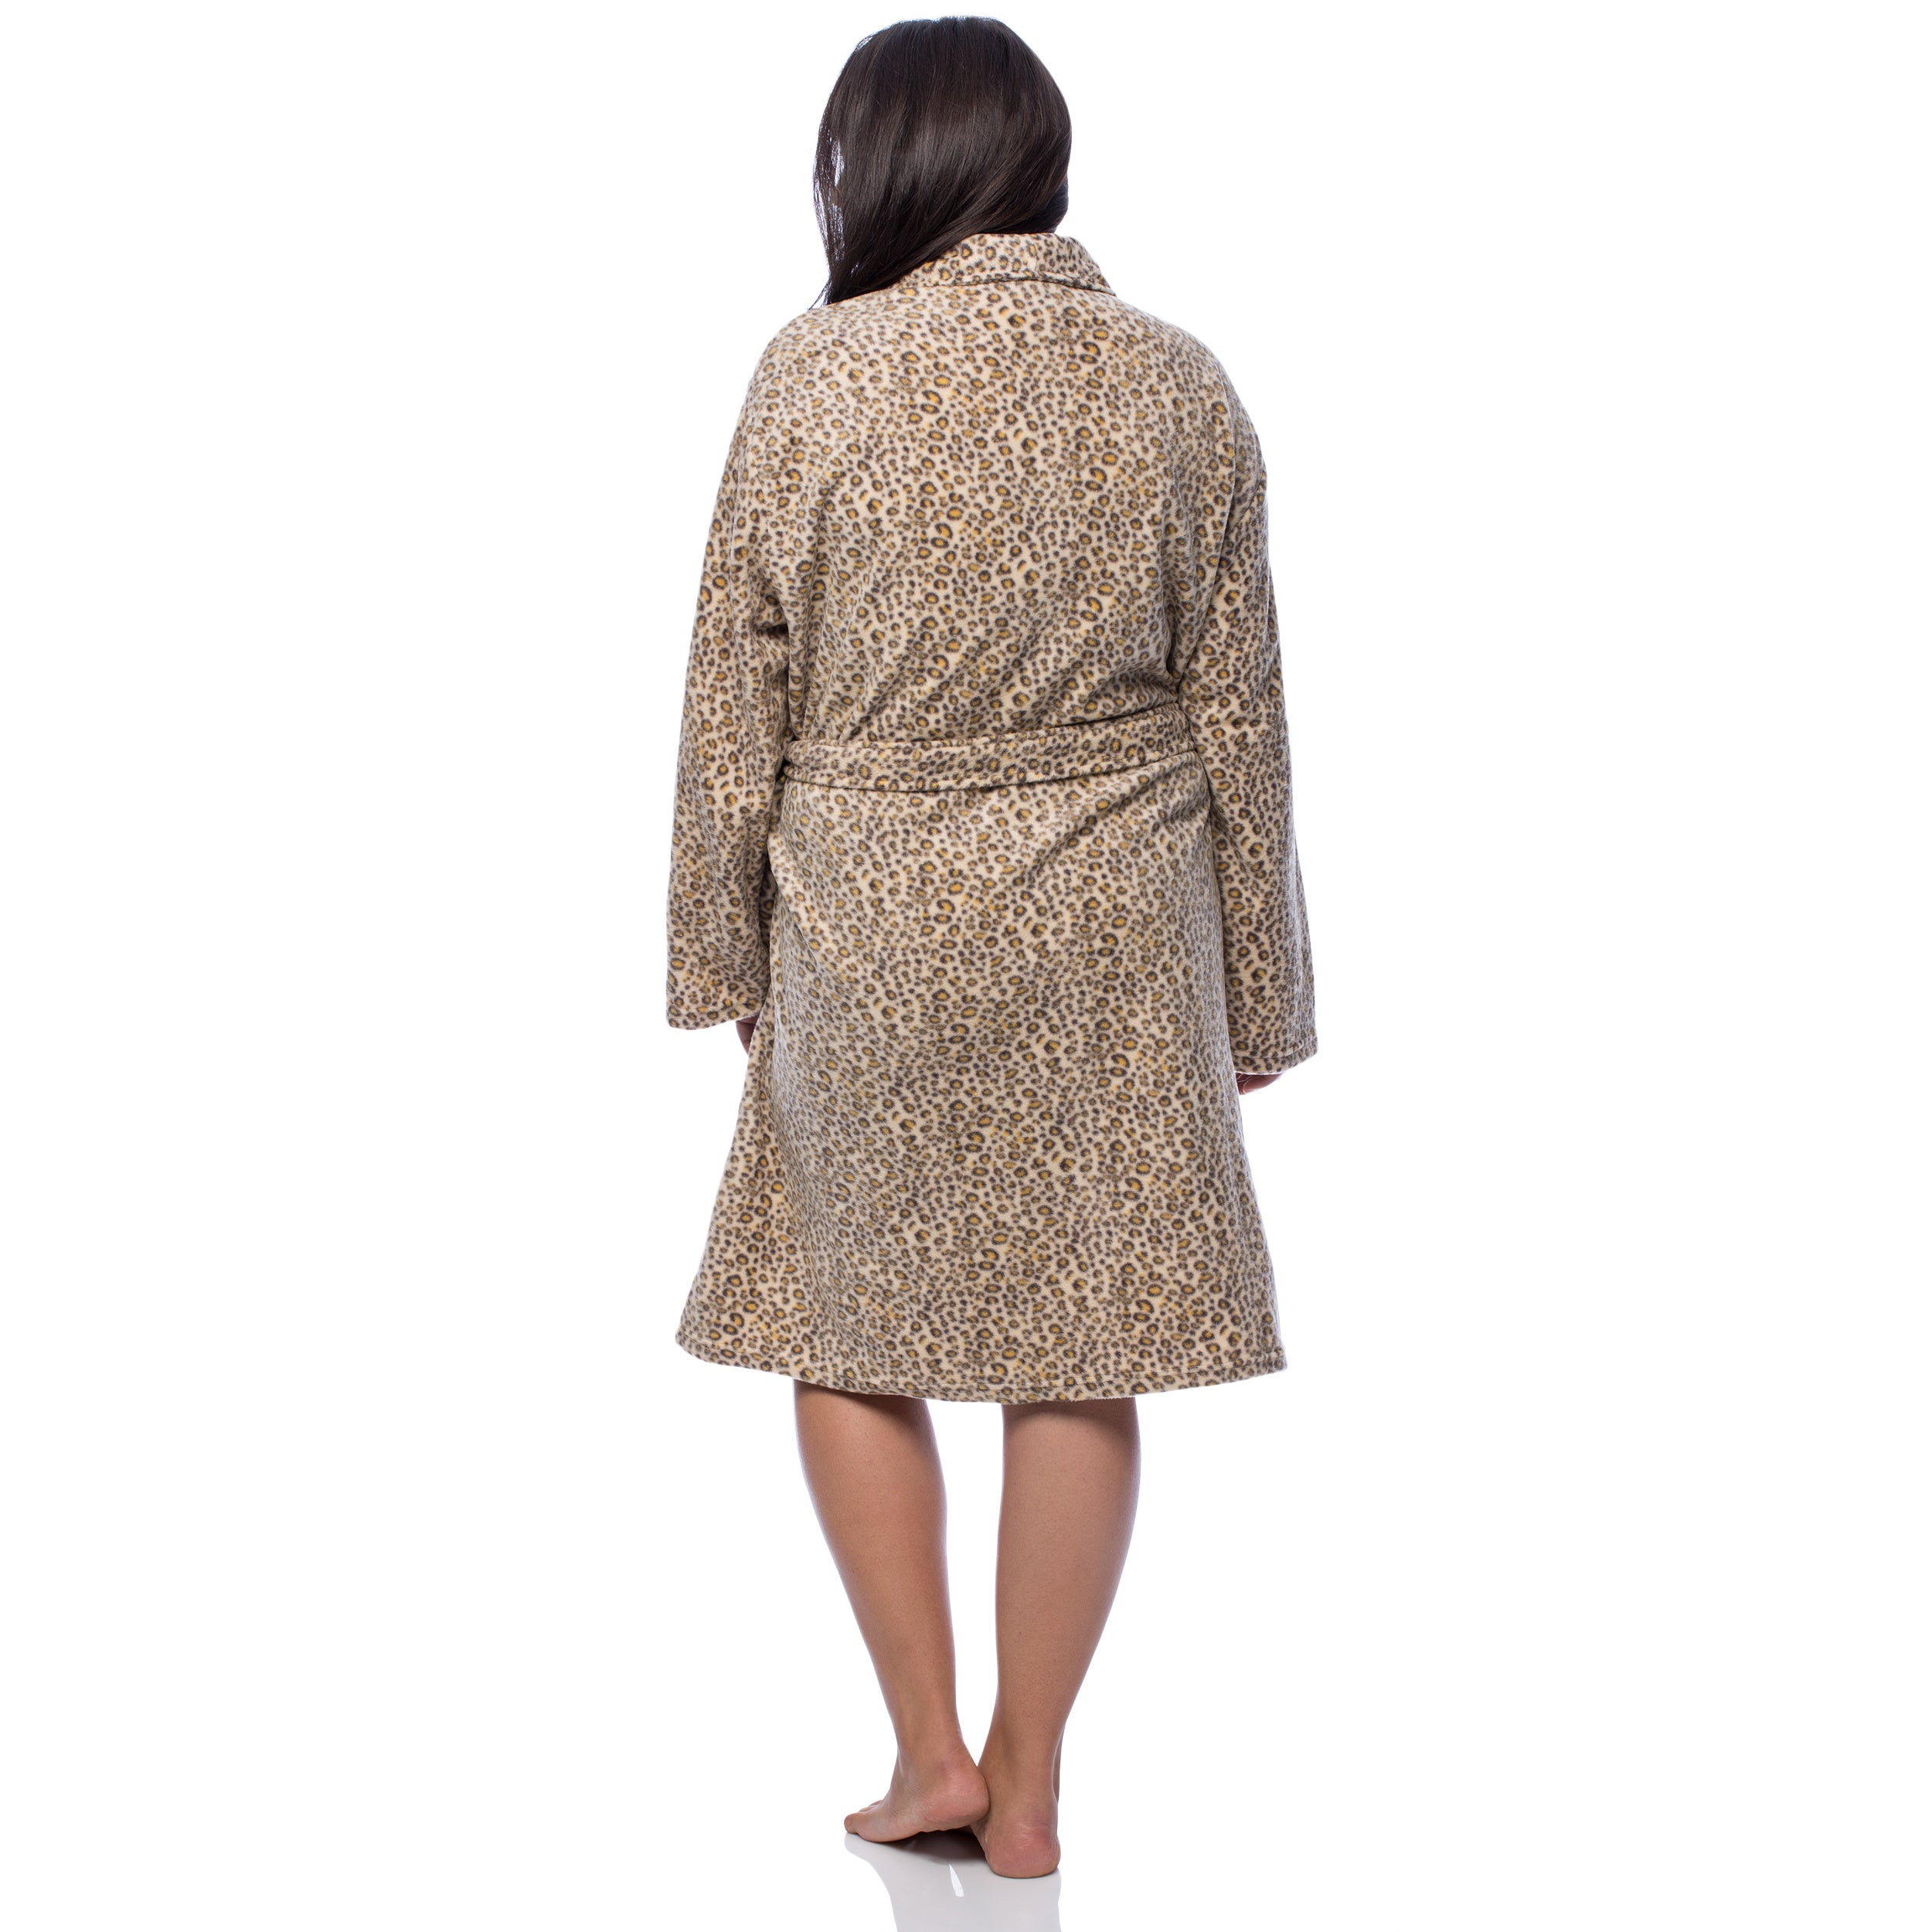 La Cera Womens Plus Size Cheetah Print Fleece Robe Free Shipping